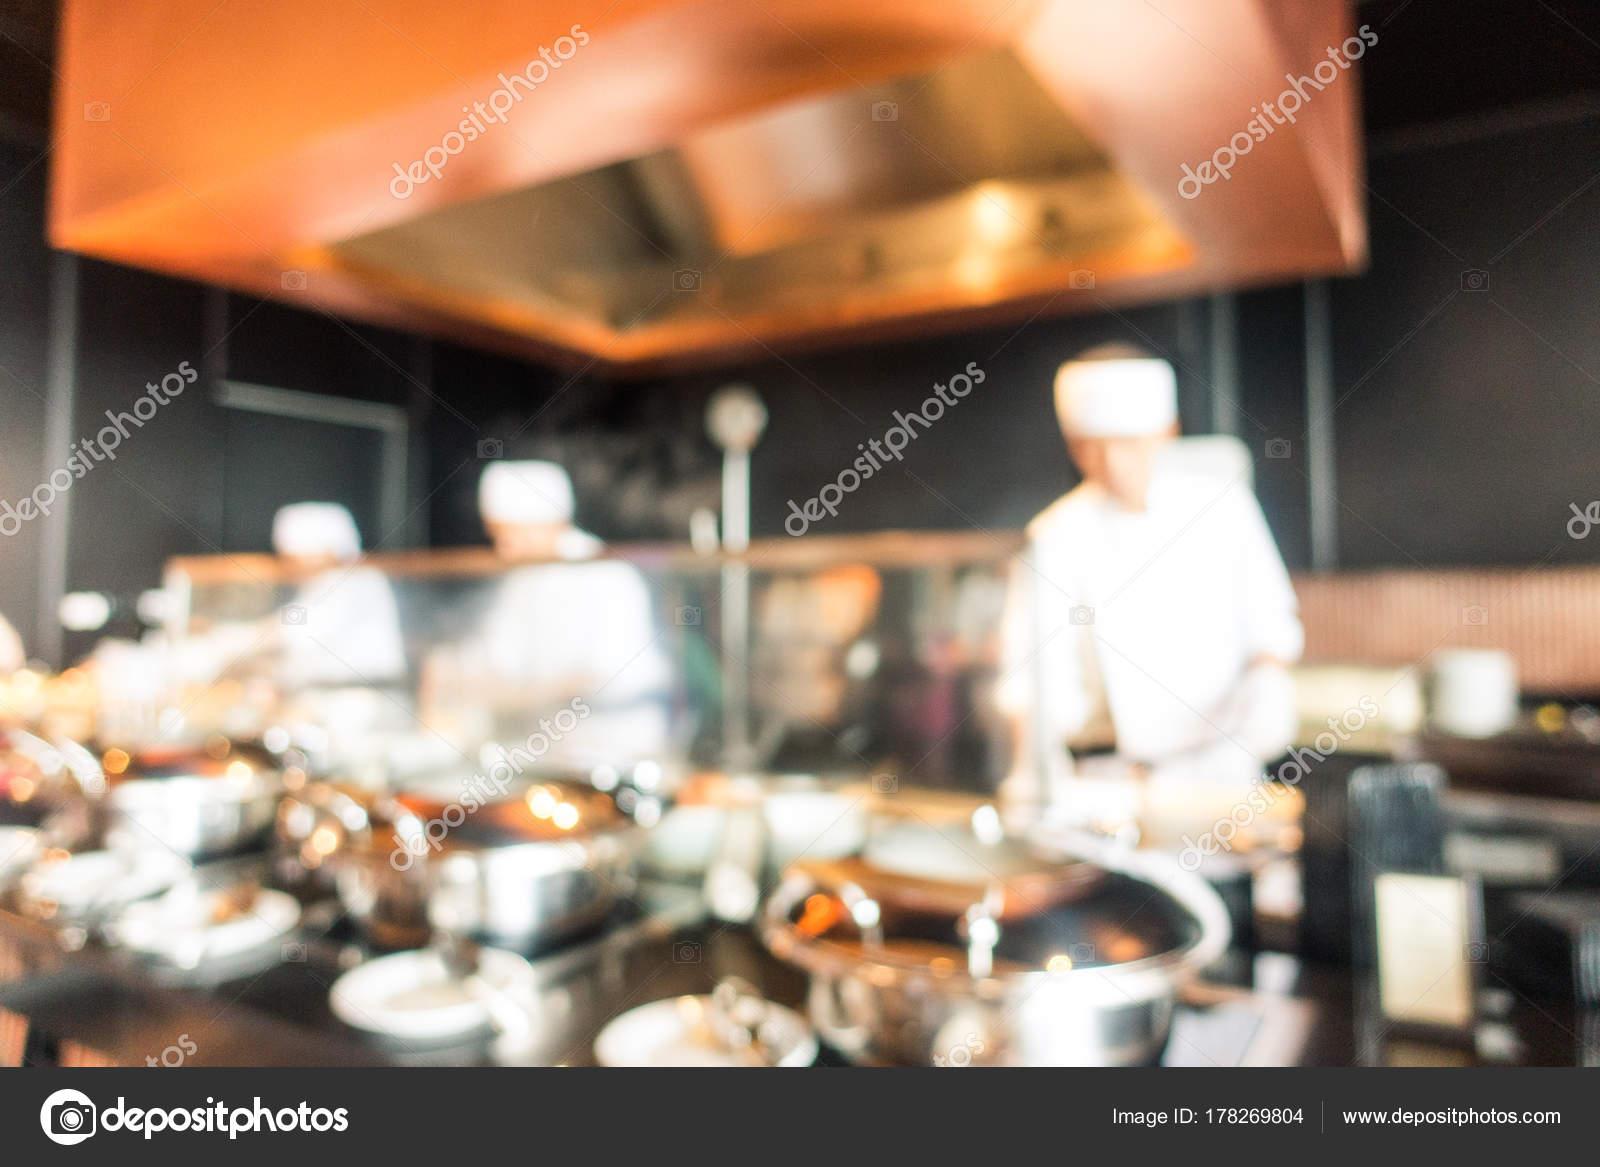 Resumen restaurante de Blur — Foto de stock © mrsiraphol #178269804